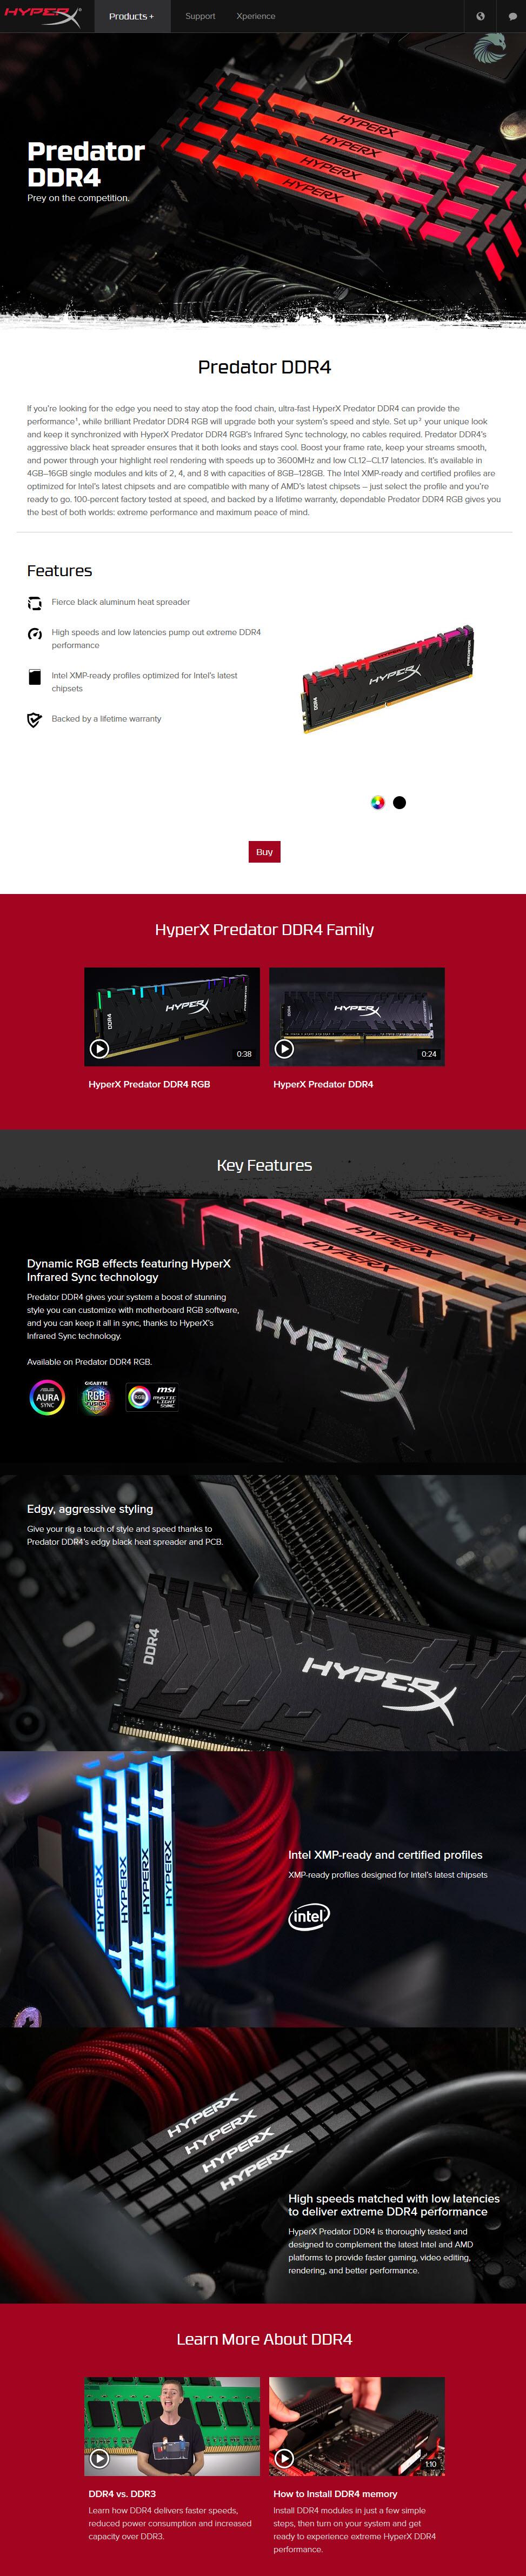 2018 06 22 22 50 56 KINGSTON HYPER X PREDATOR RGB DDR4 2933MHz 4x8GB Review